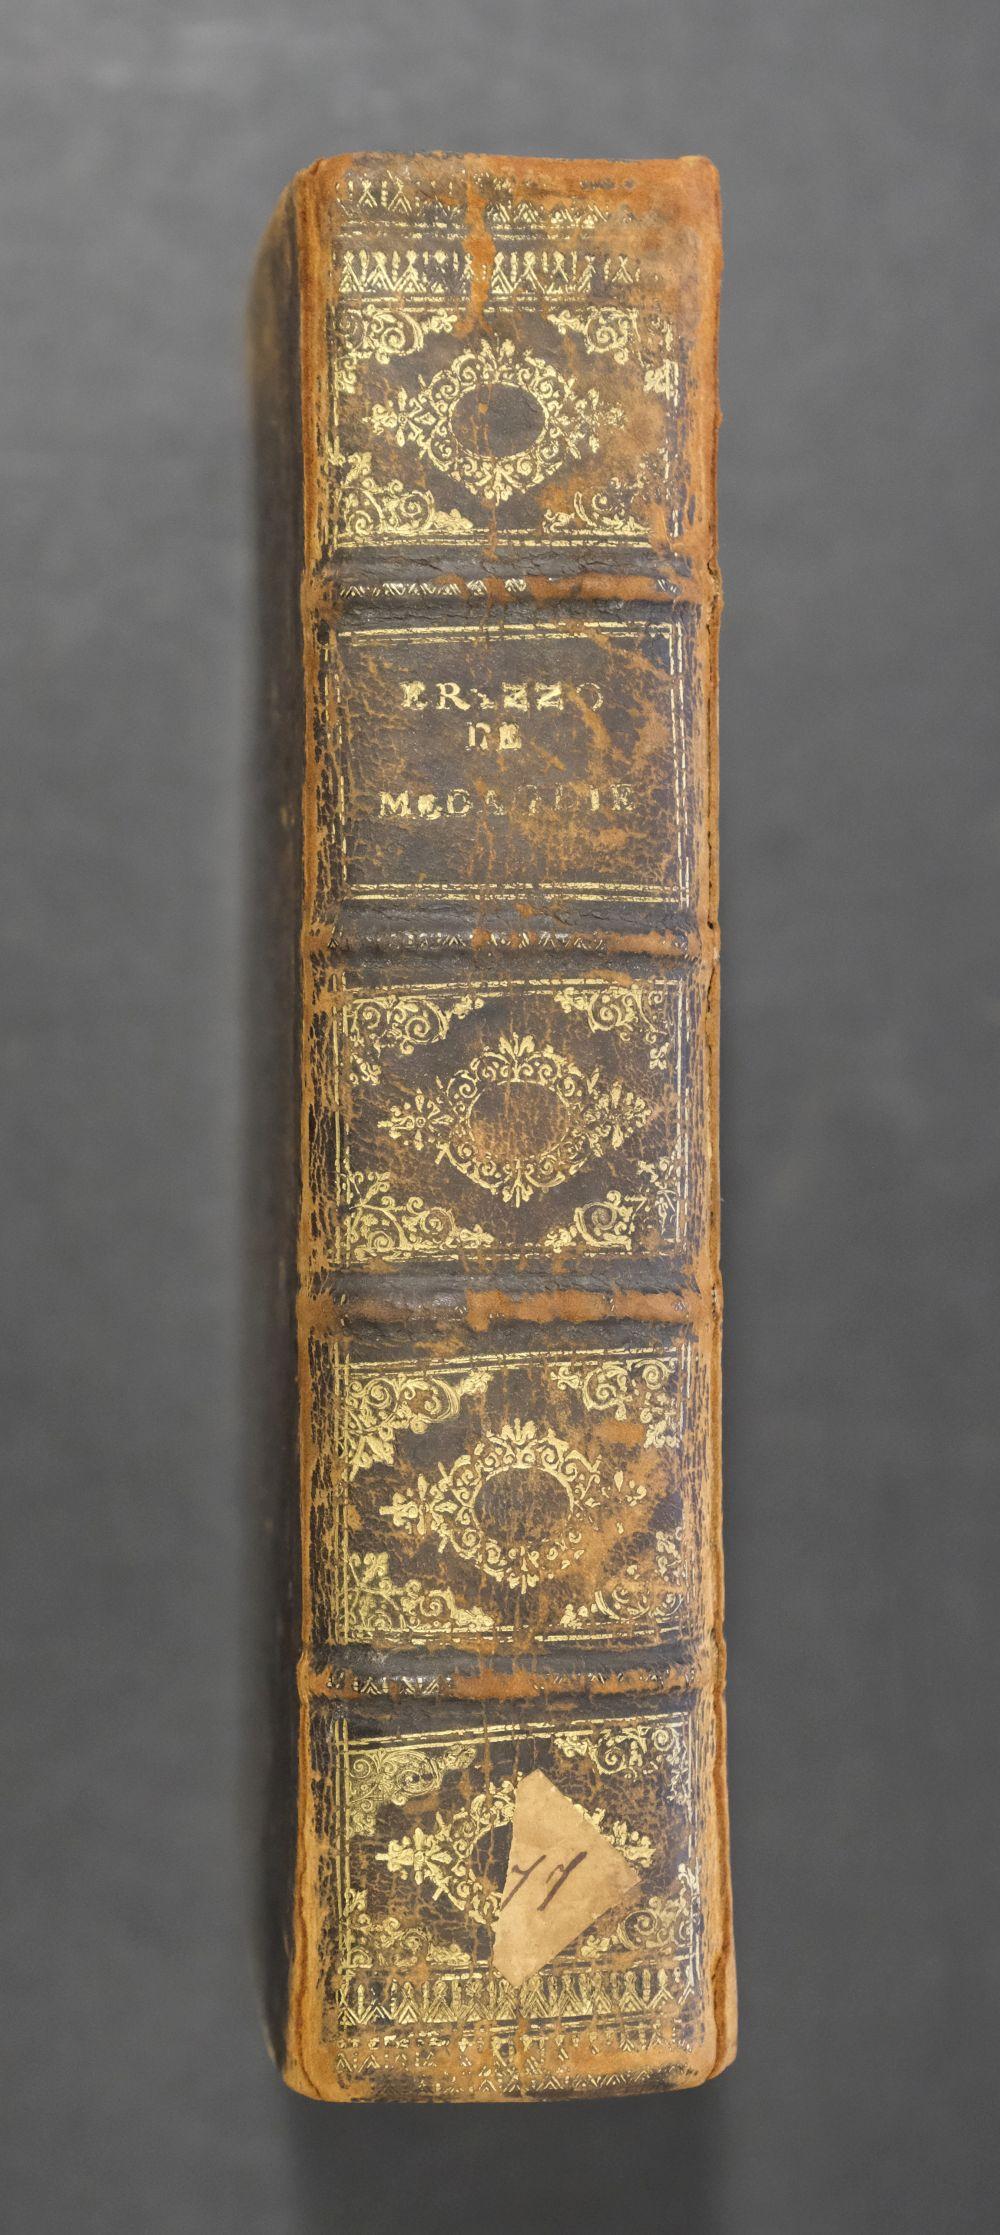 Erizzo (Sebastiano). Discorso sopra le medaglie, 4th edition, 1584, ex libris Fletcher of Saltoun - Image 3 of 11